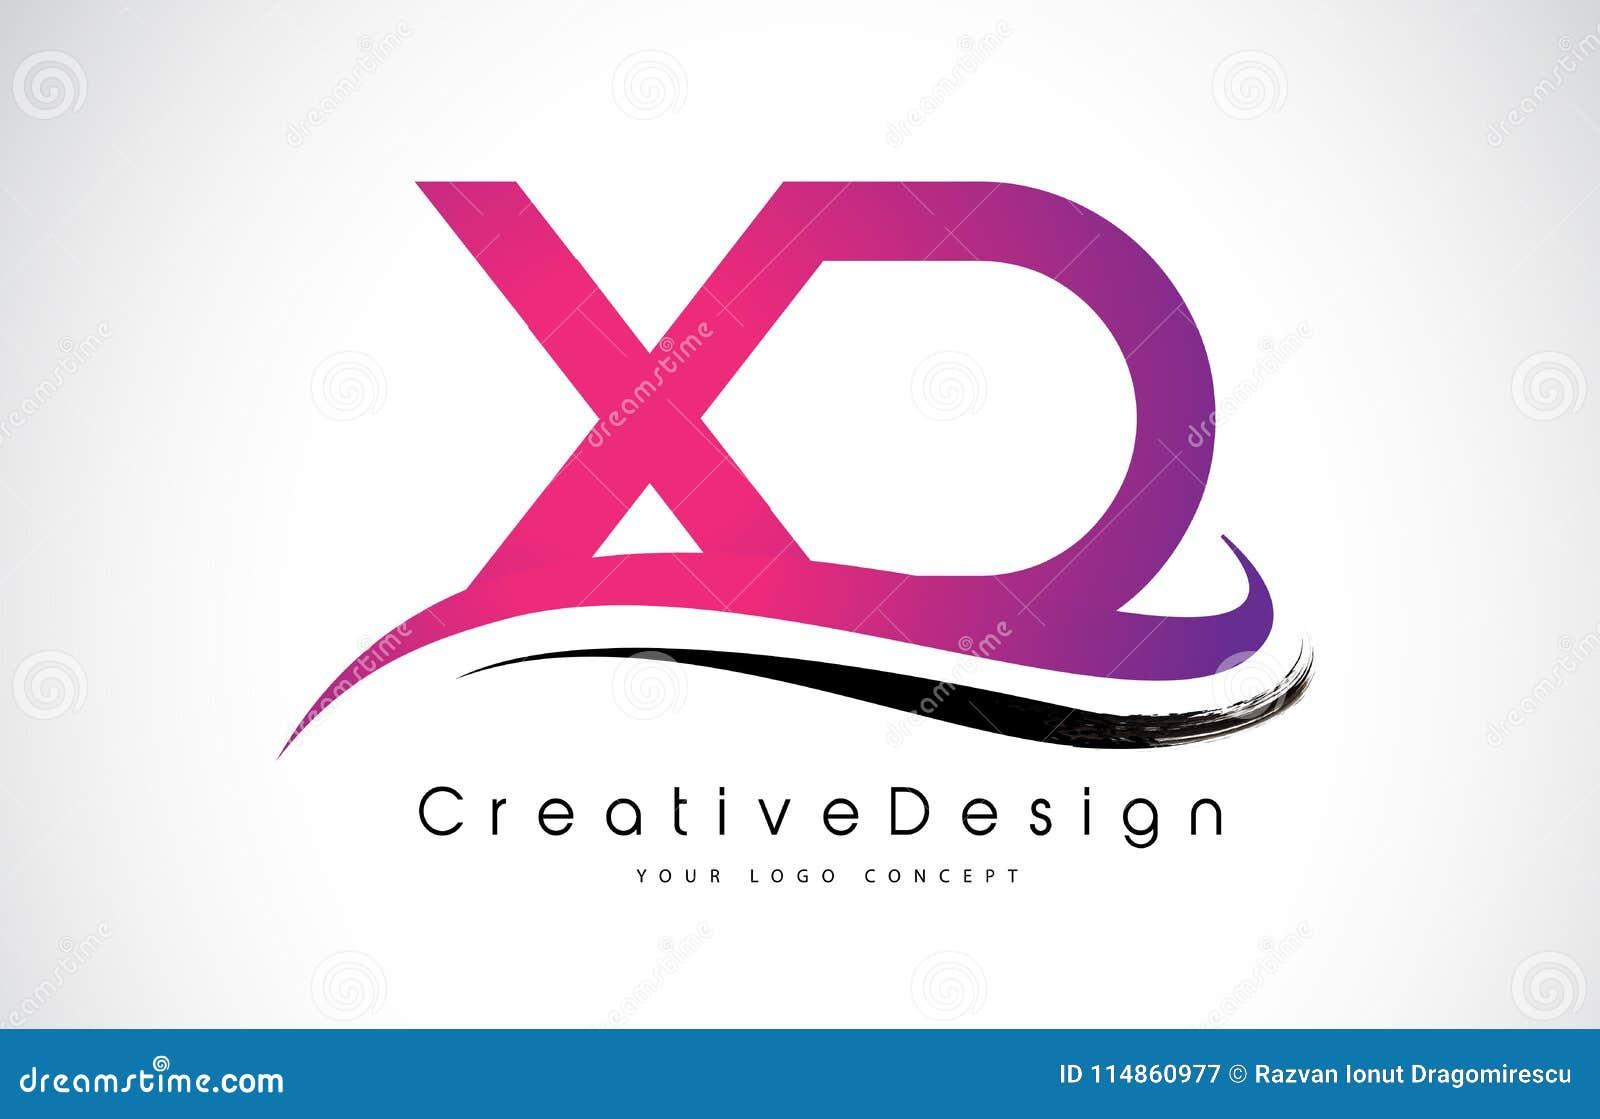 XD X D Letter Logo Design. Creative Icon Modern Letters Vector L ...